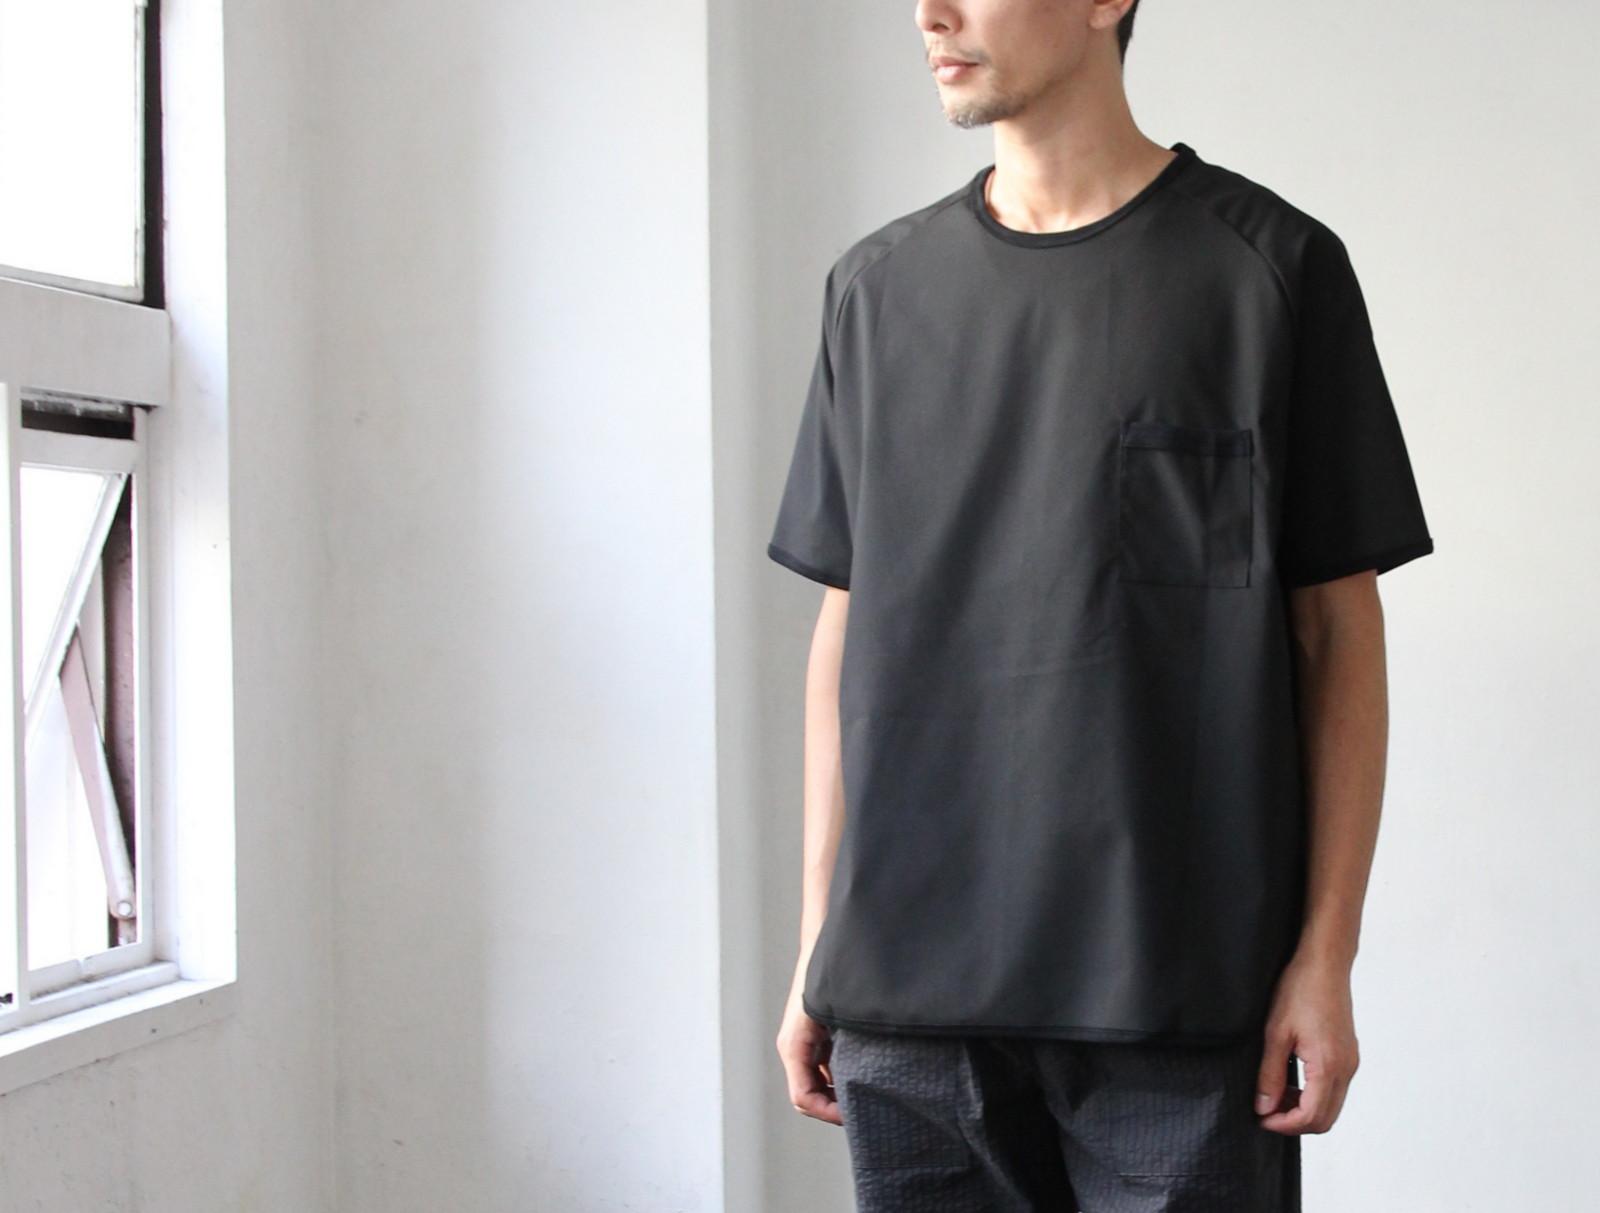 Tro Cool T-shirt_c0379477_20191456.jpg